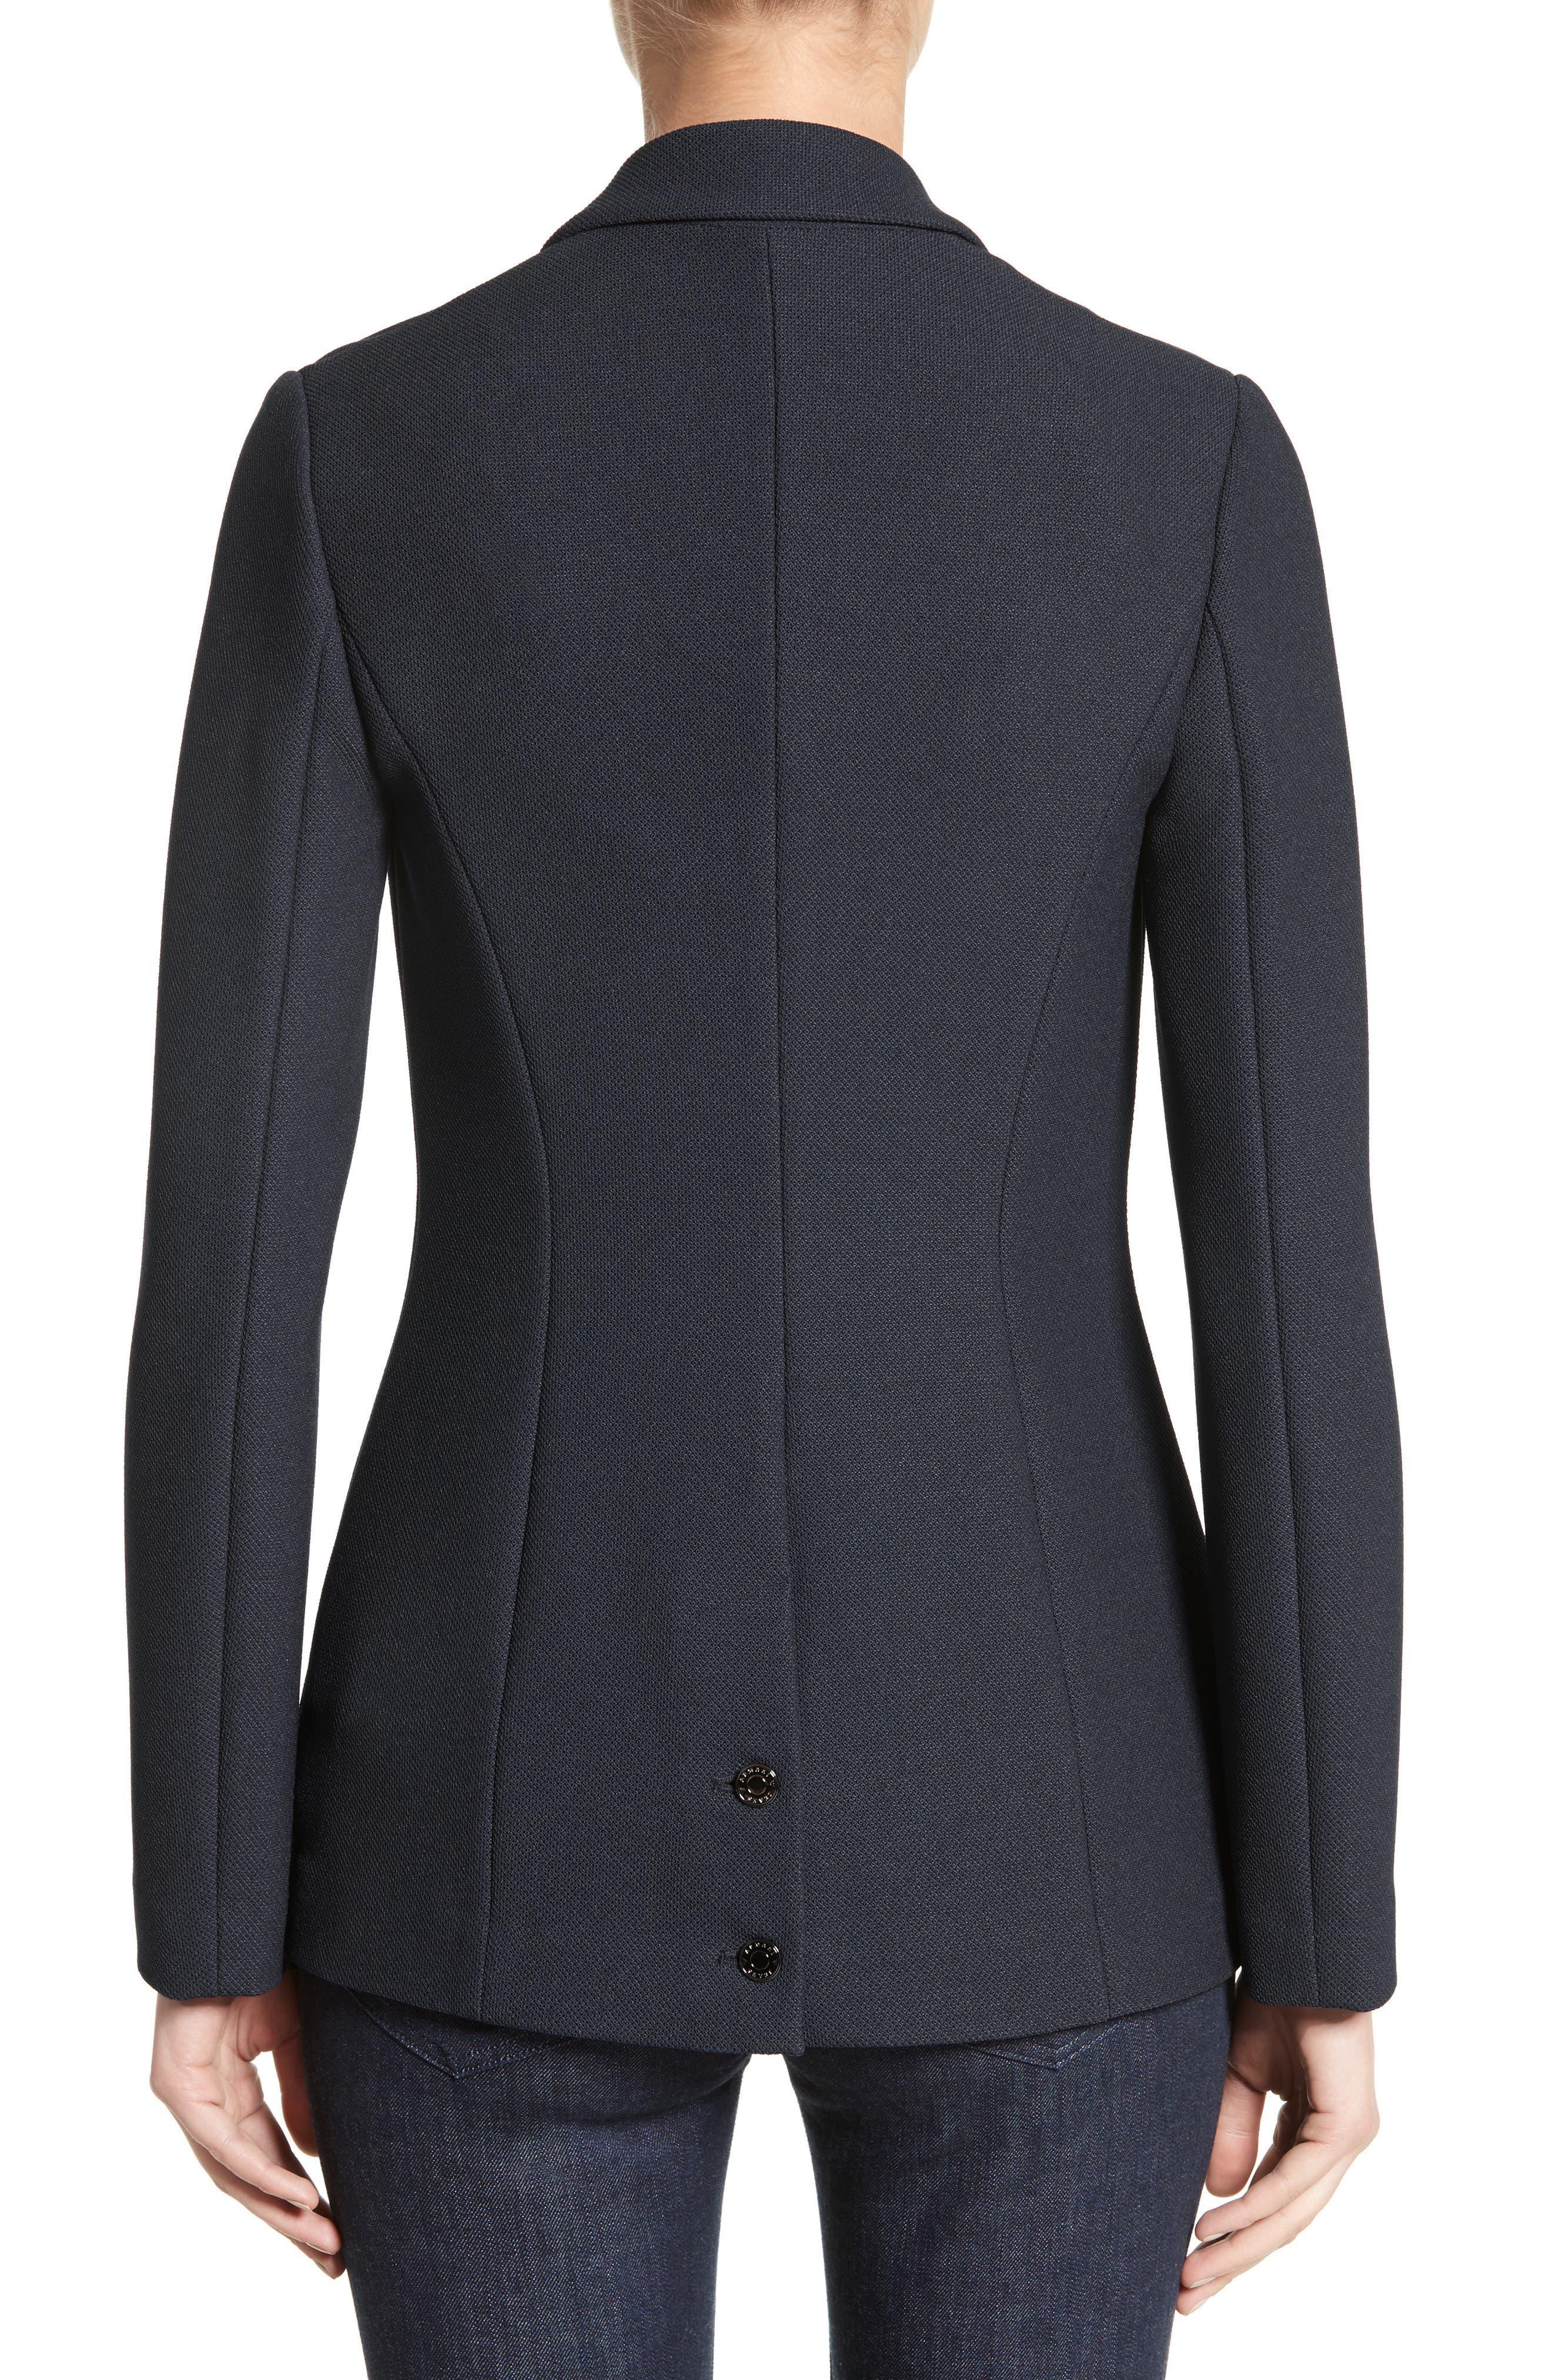 Armani Jeans Piqué Double Breasted Blazer,                             Alternate thumbnail 2, color,                             484